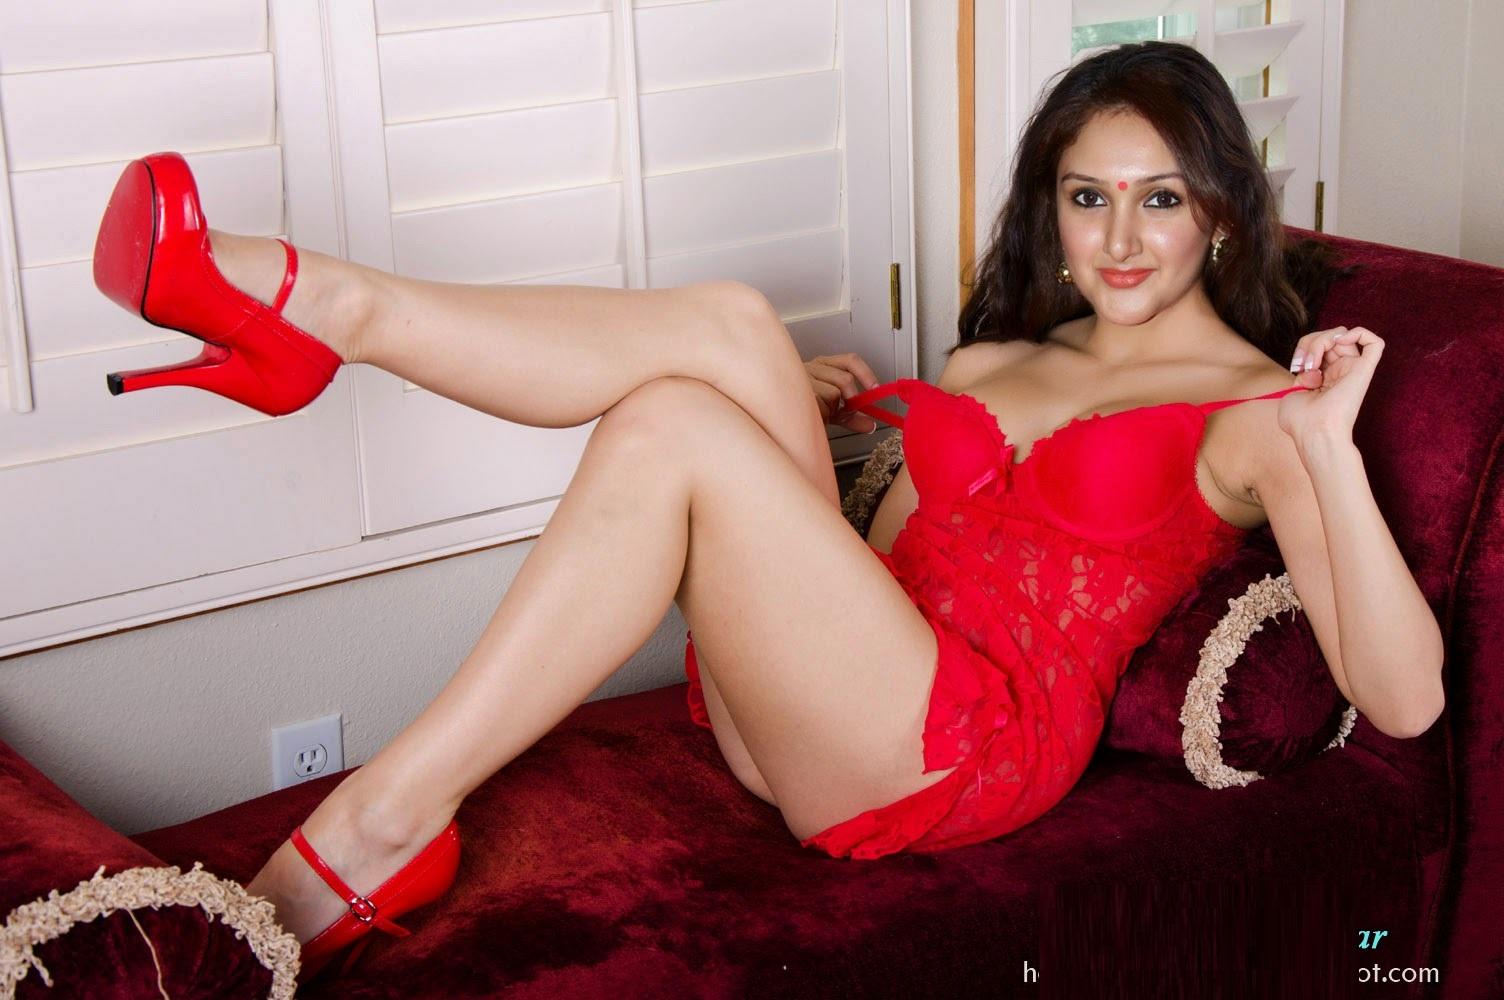 Sexy latina women